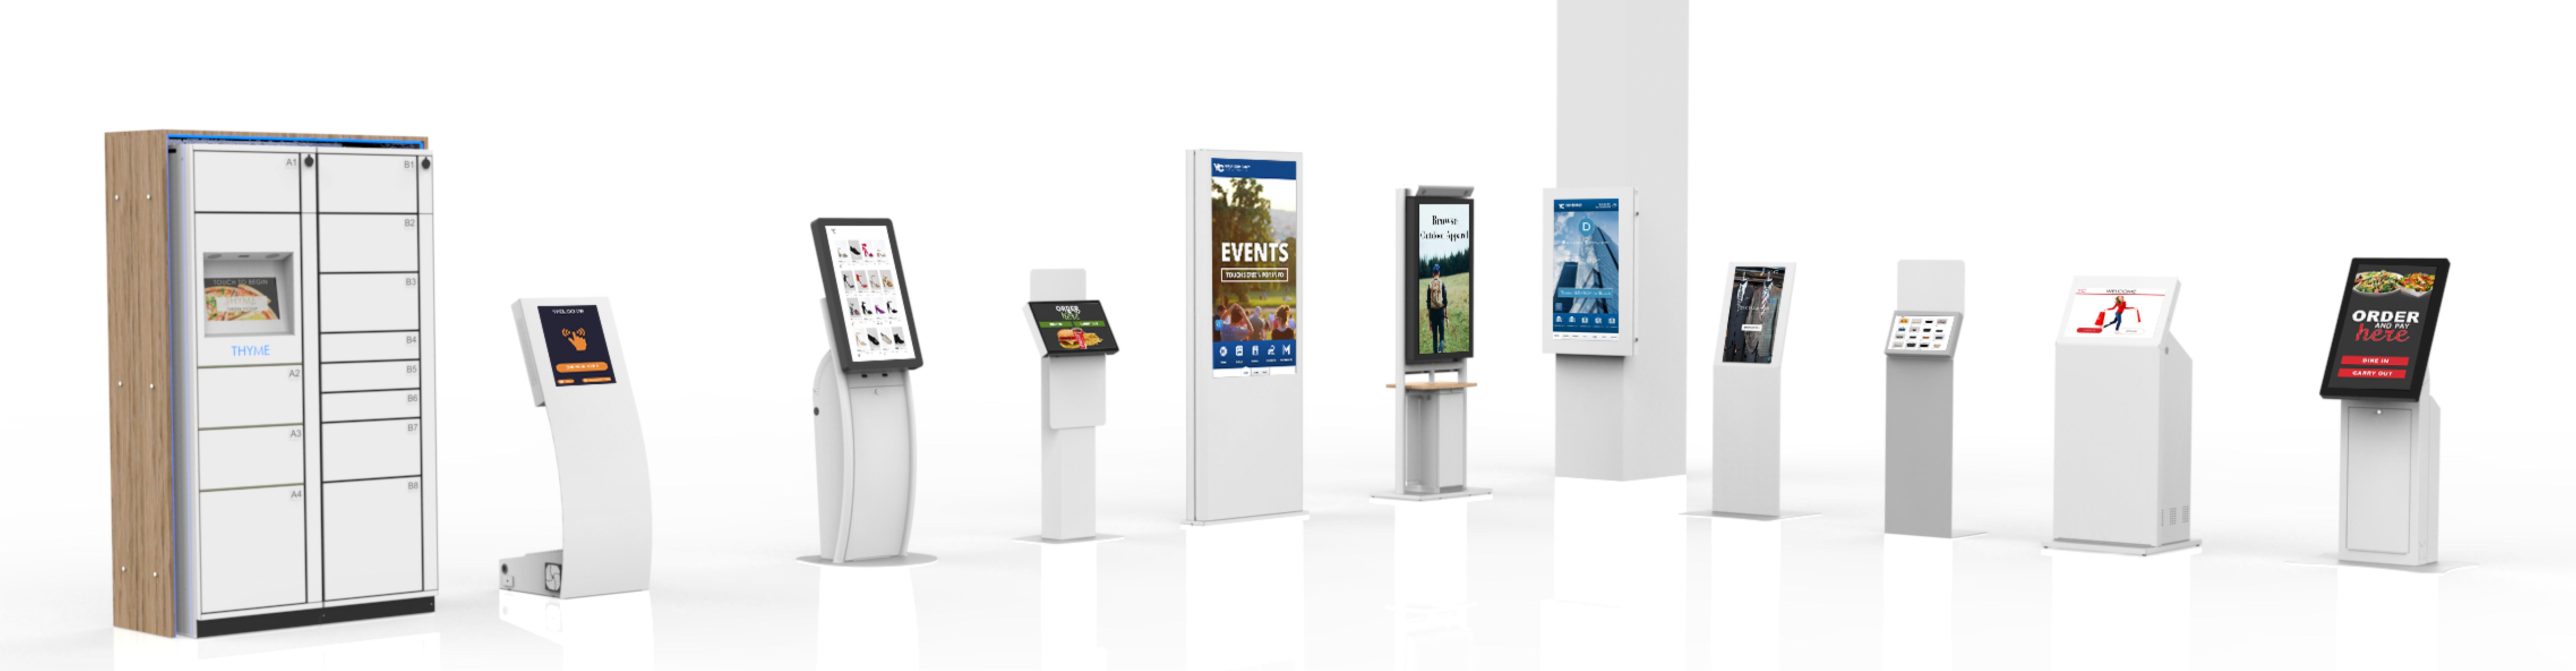 Kiosks, Interactive Kiosk & Digital Kiosks | Meridian Kiosks